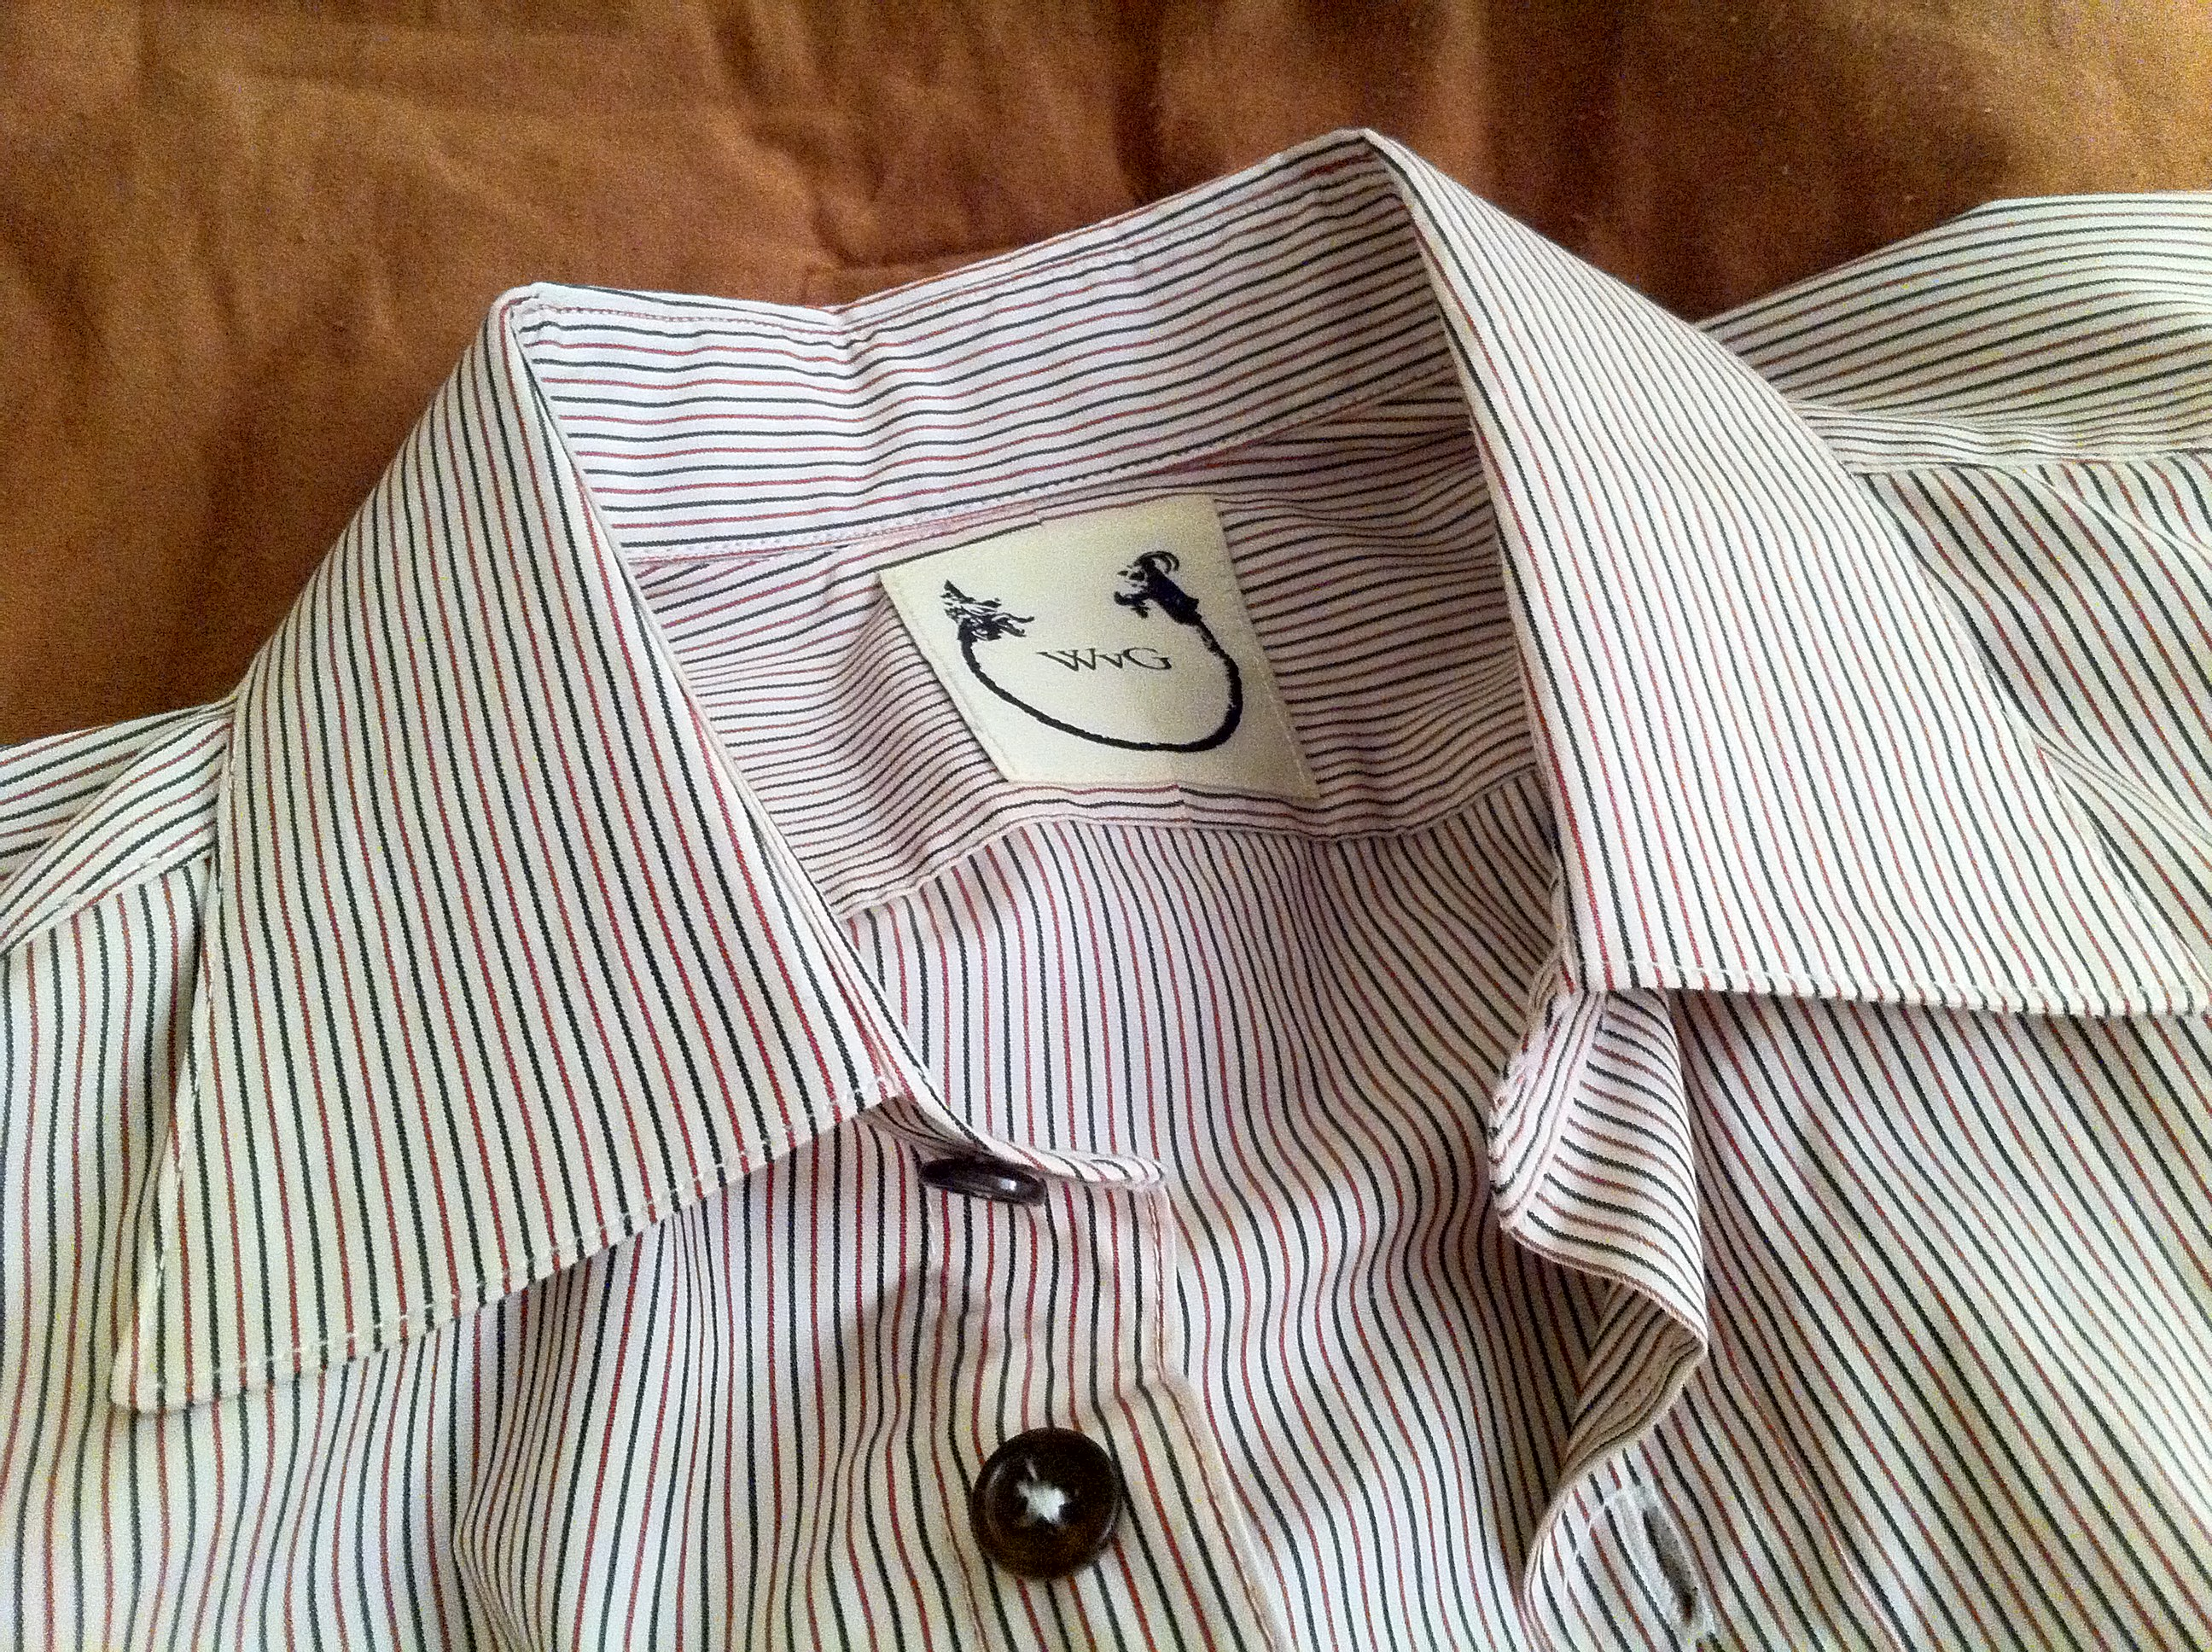 Wolf Vs Goat Sea Island Cotton Bd Shirt Medium Styleforum